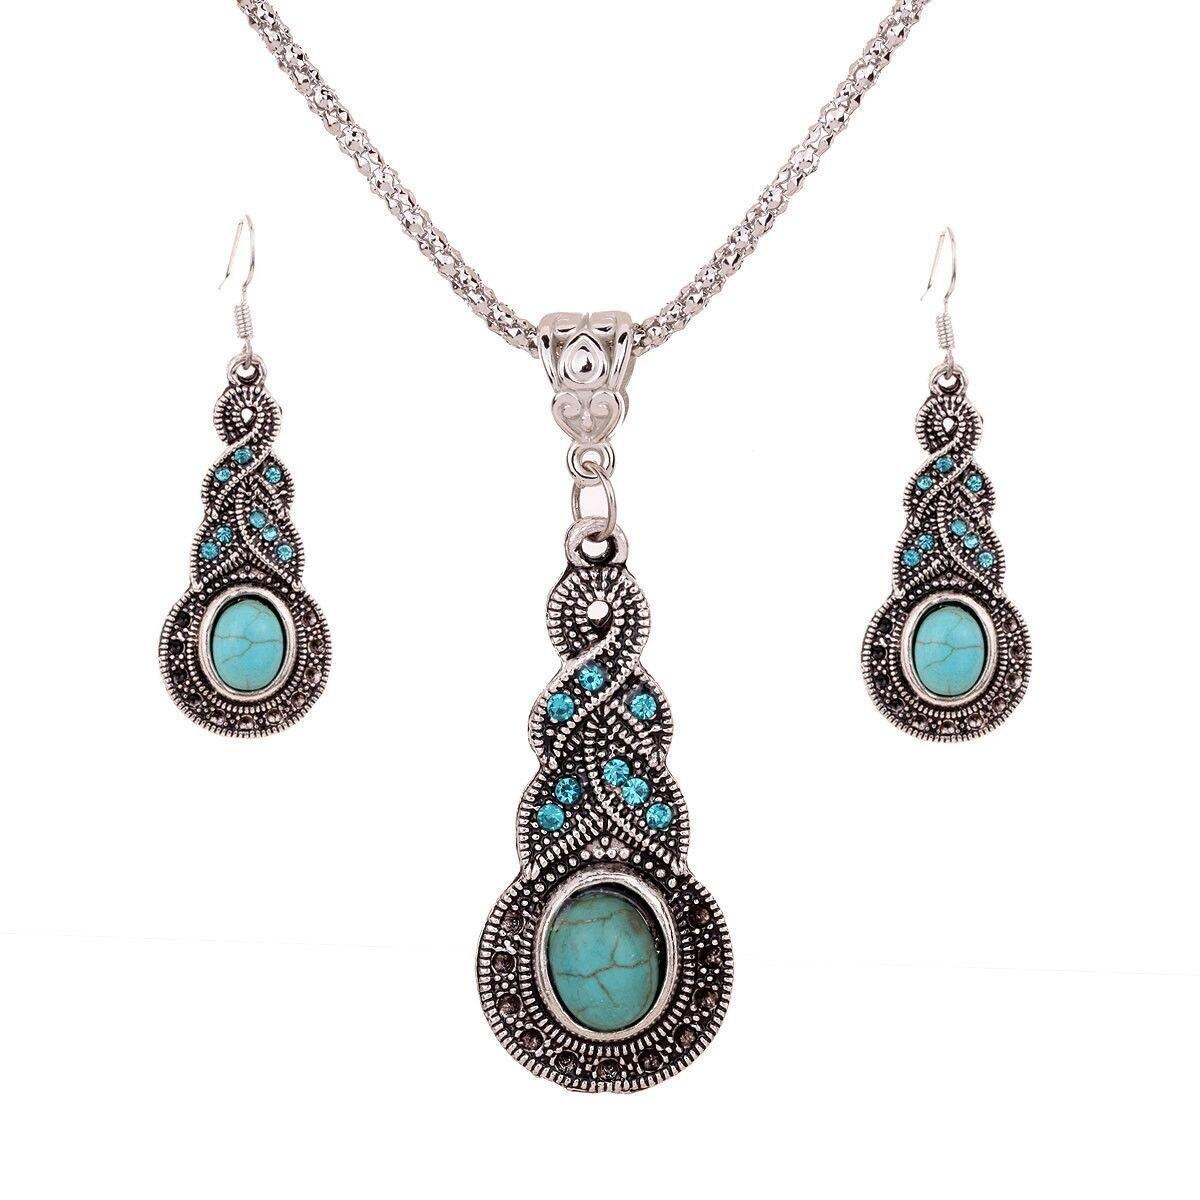 Fashion Jewelry Necklace Tears Retro Ethnic Necklace Set Wholesale Crystal Necklace Pendant Women's Elegant Necklace